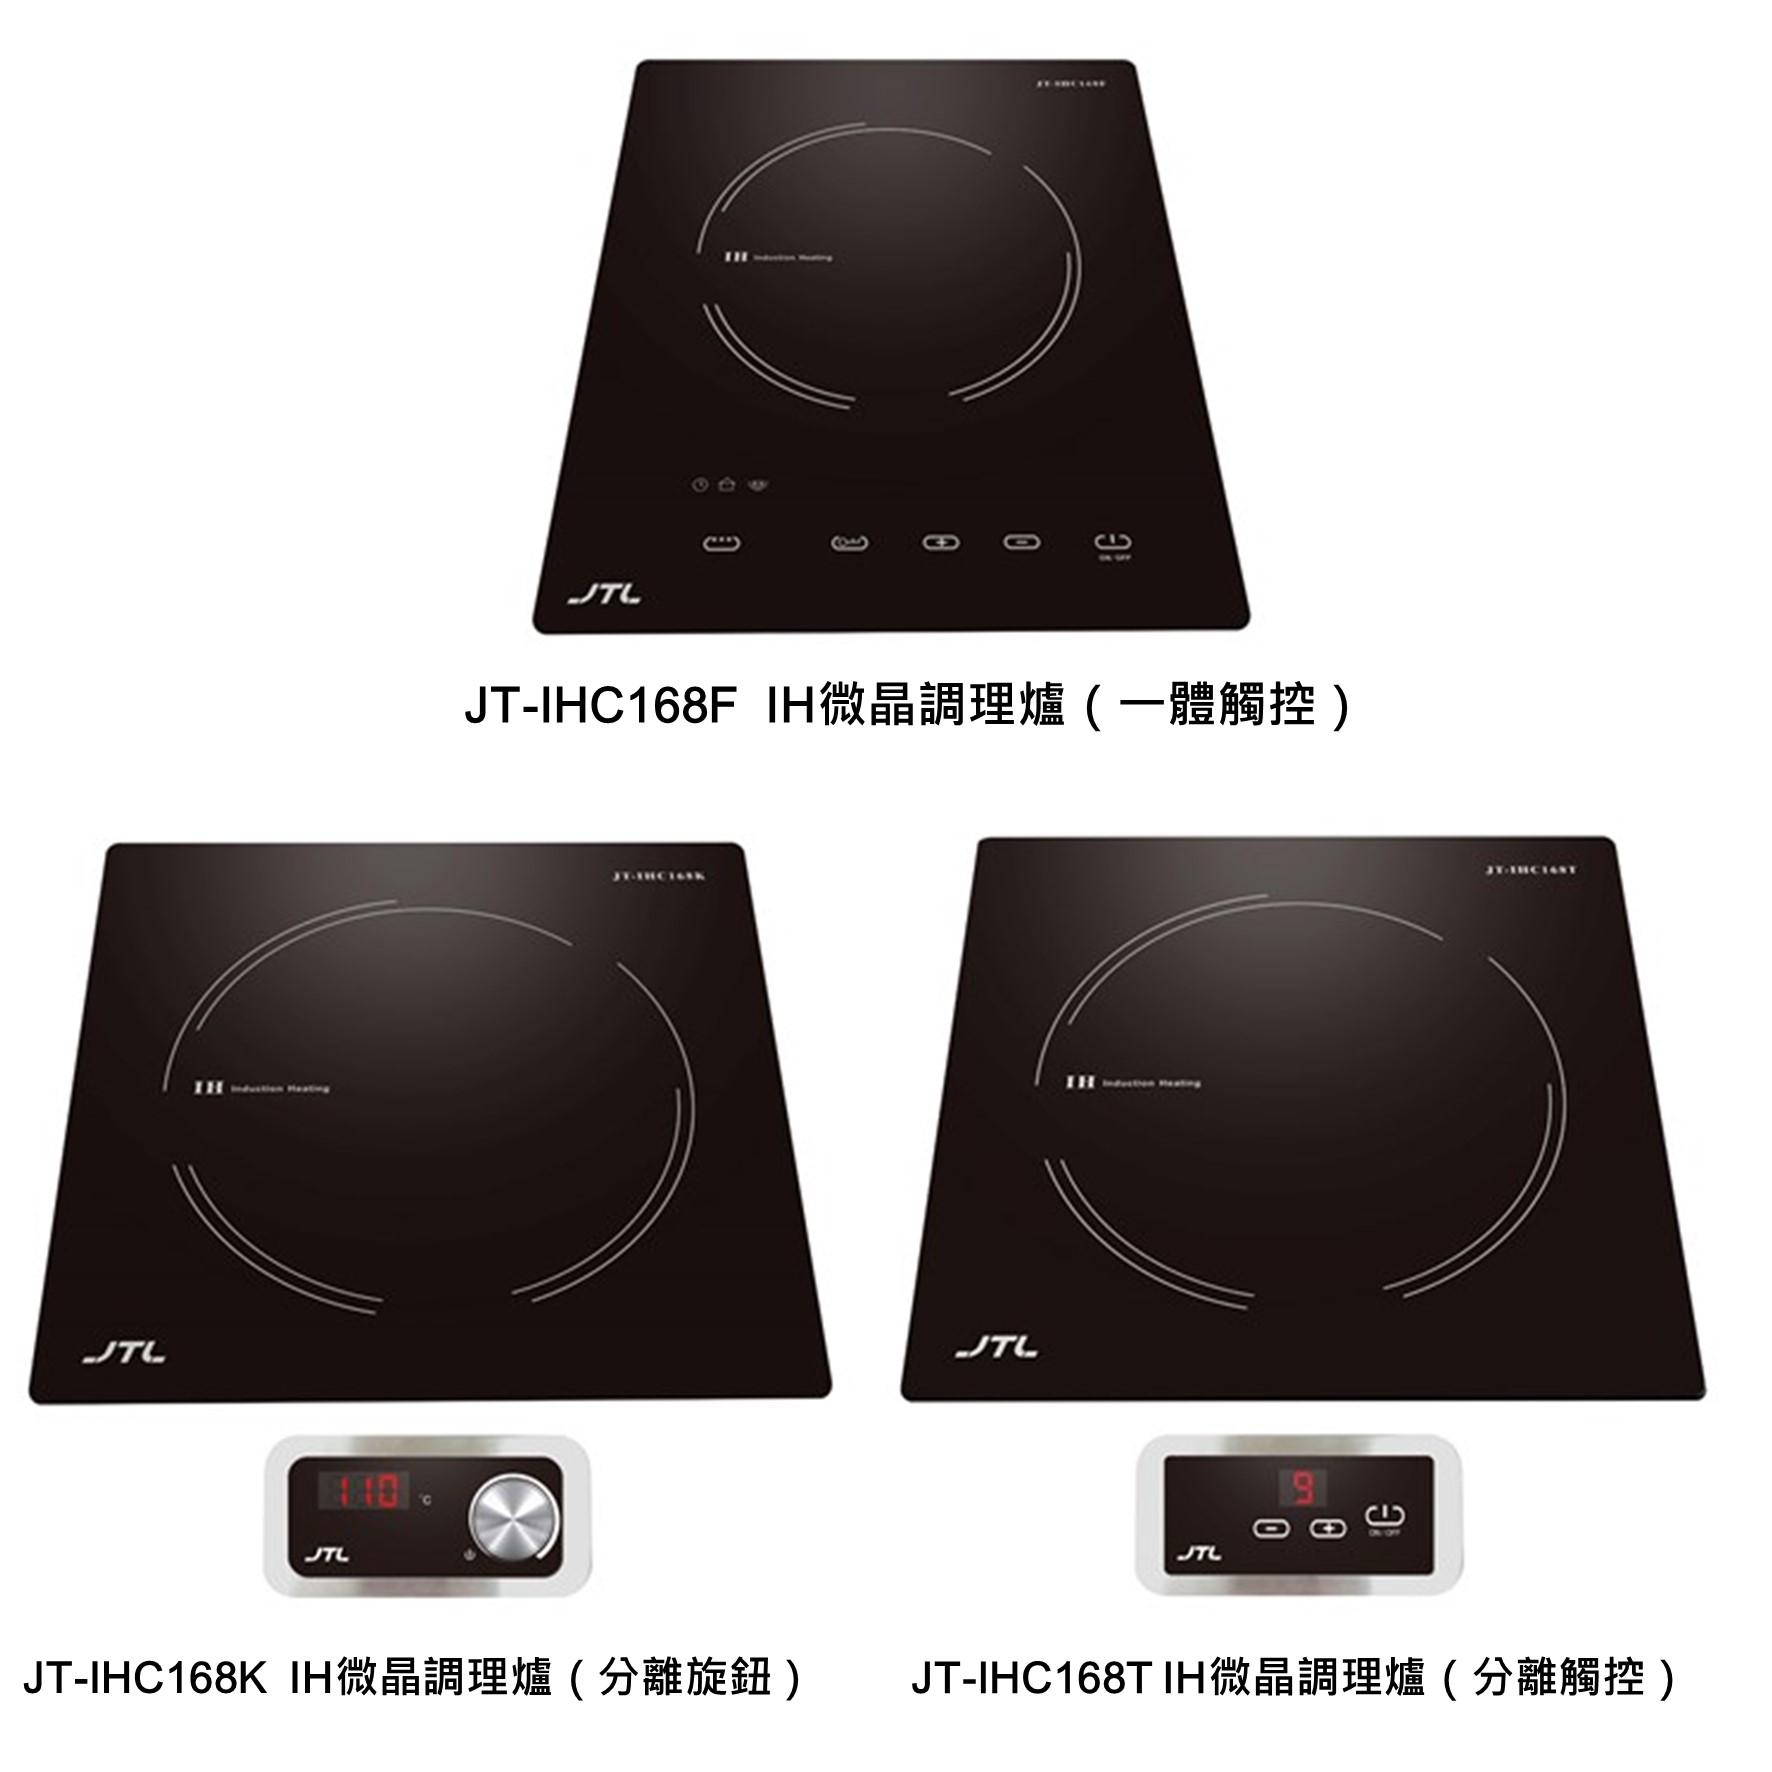 IH微晶調理爐(F一體觸控、K分離旋鈕、T分離觸控)